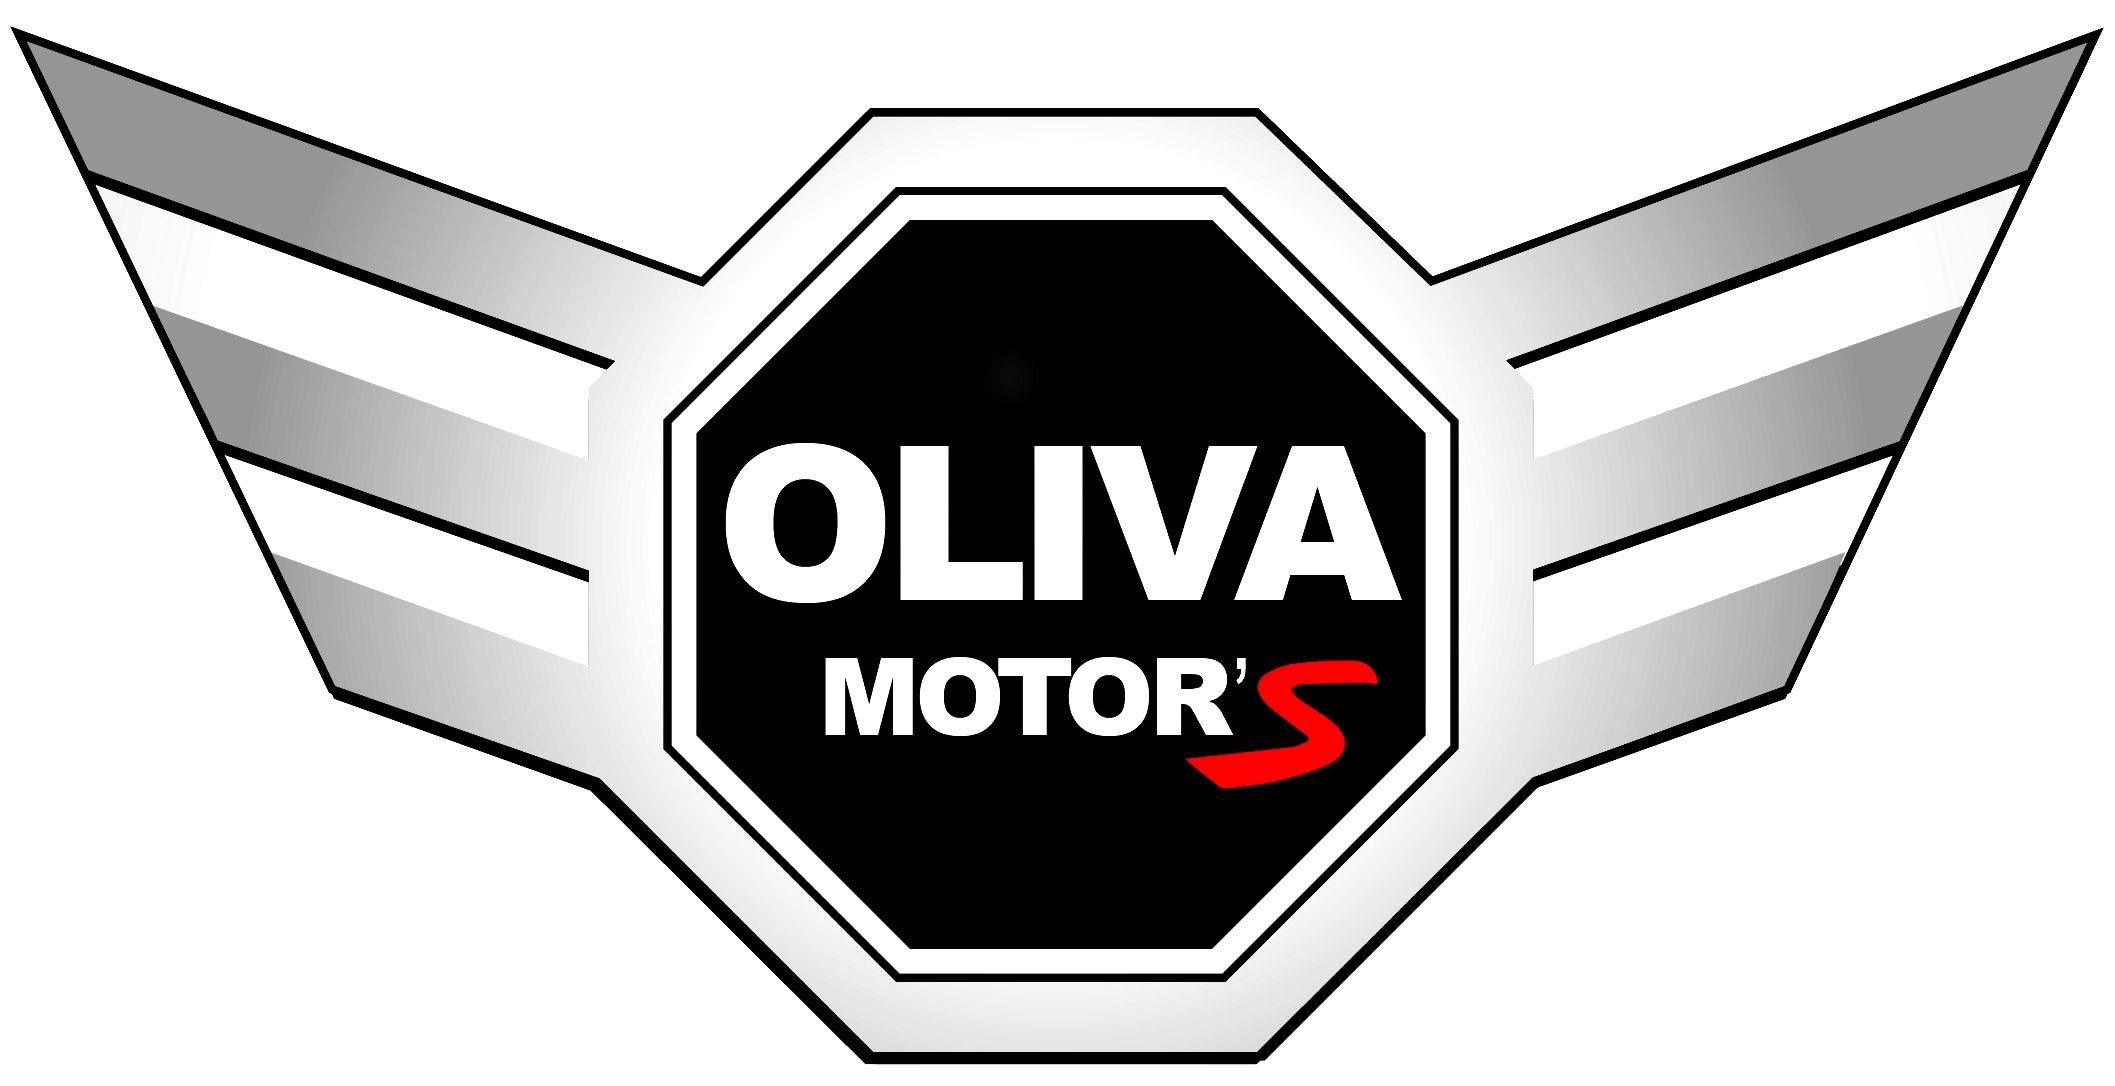 Oliva Motor's